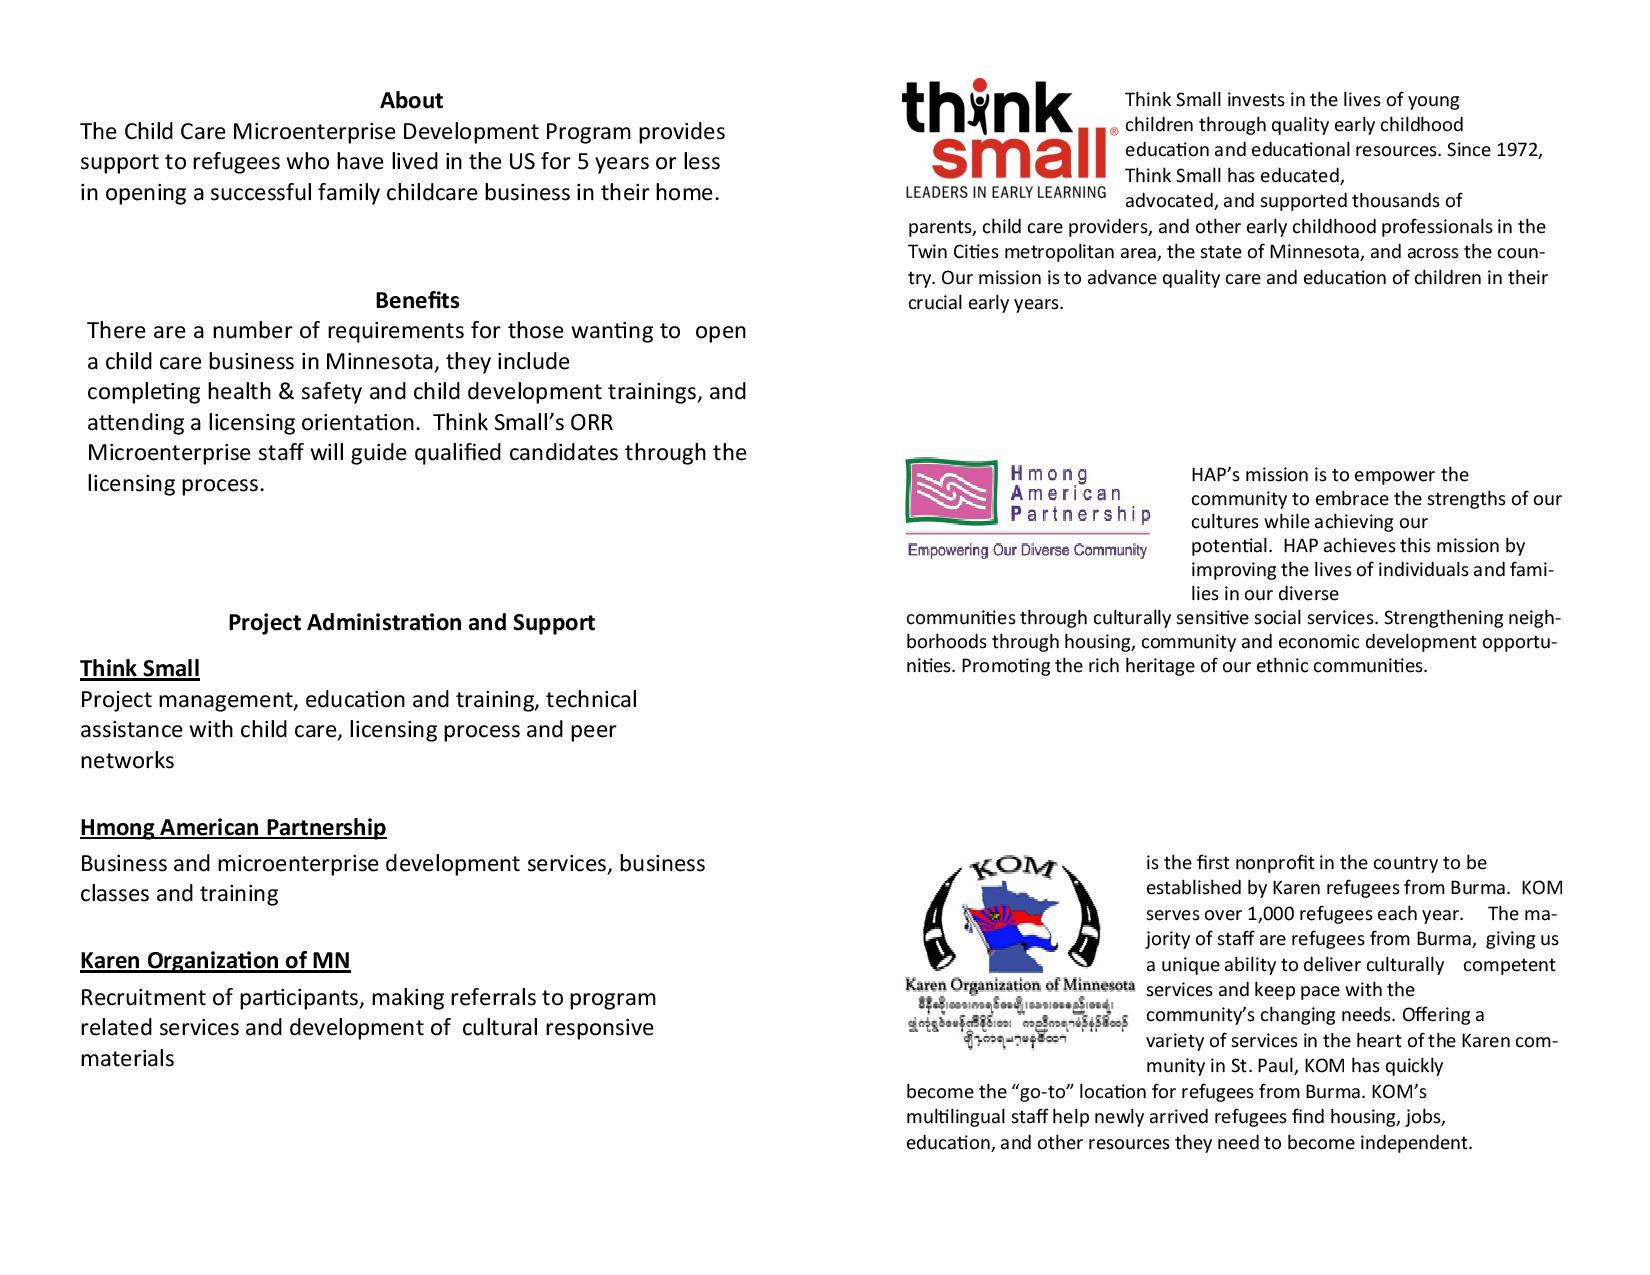 ORR_Marketing_Brochure_NEW-page-002.jpg